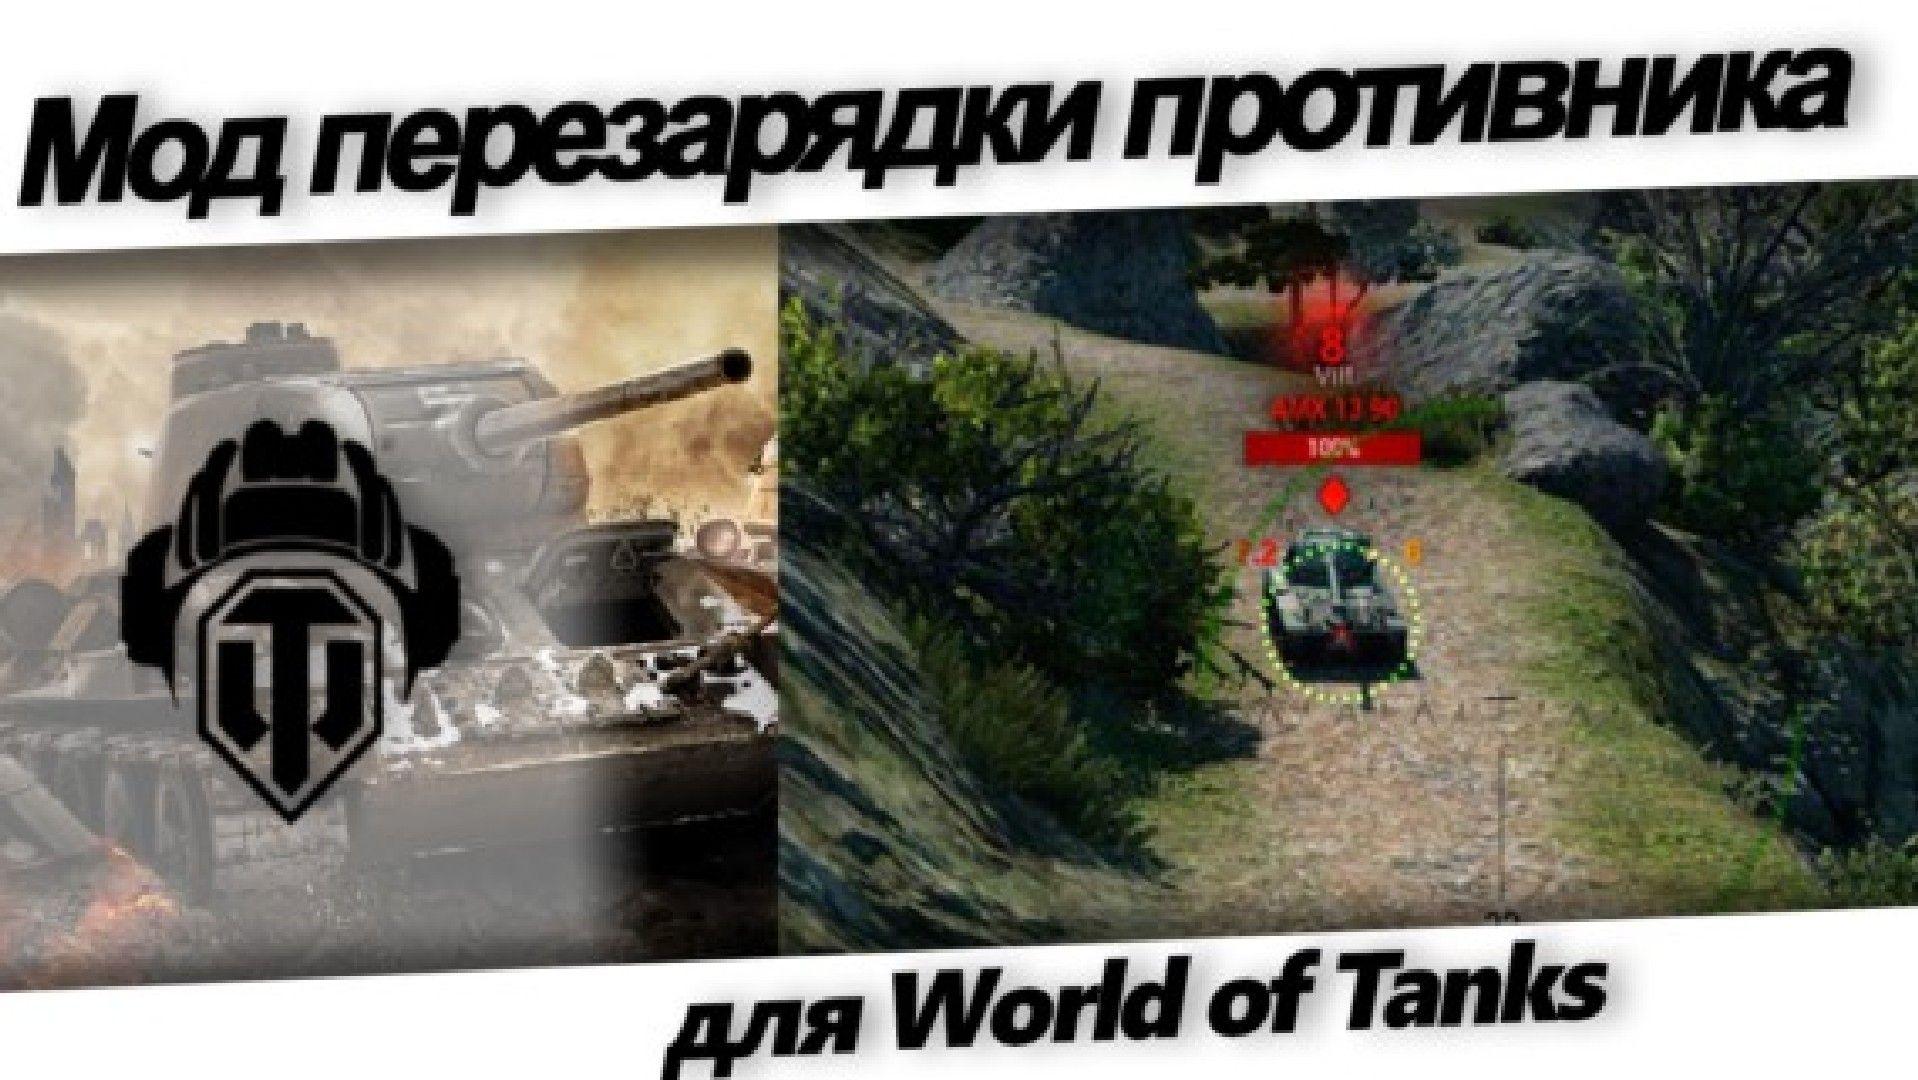 Taymer-perezaryadki-orudiya-nad-tankom-protivnika